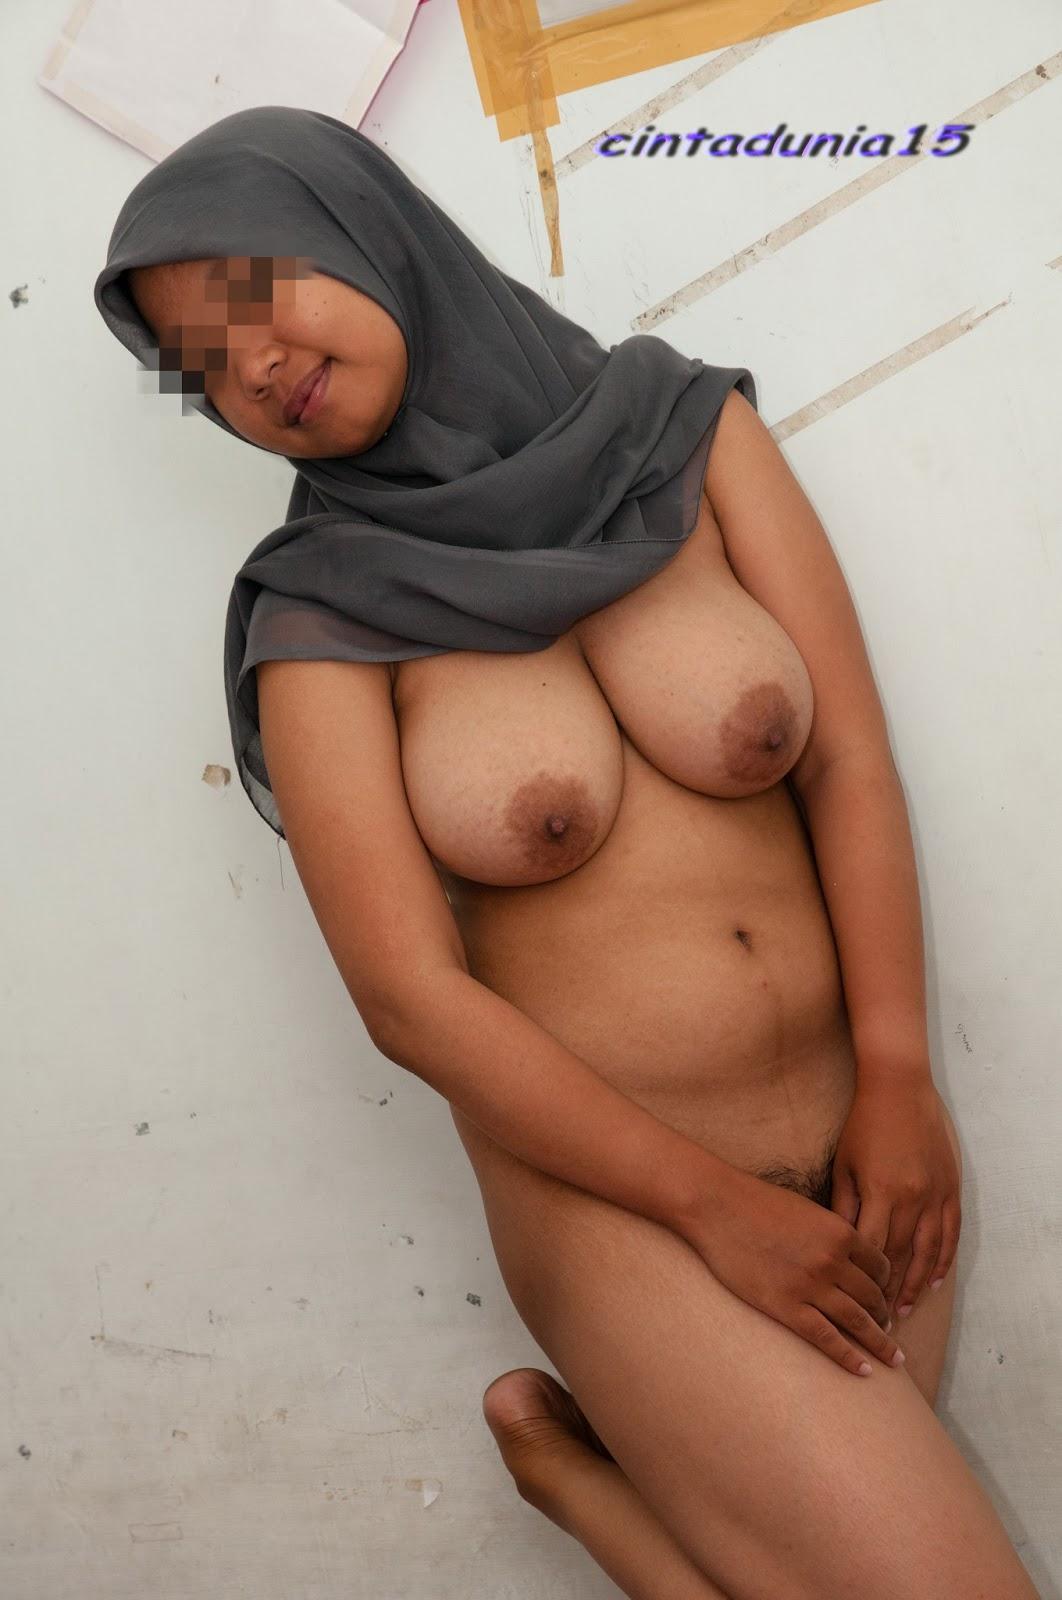 Jilbab Tobrut - Galeri Bugil Jilbab Lengkap